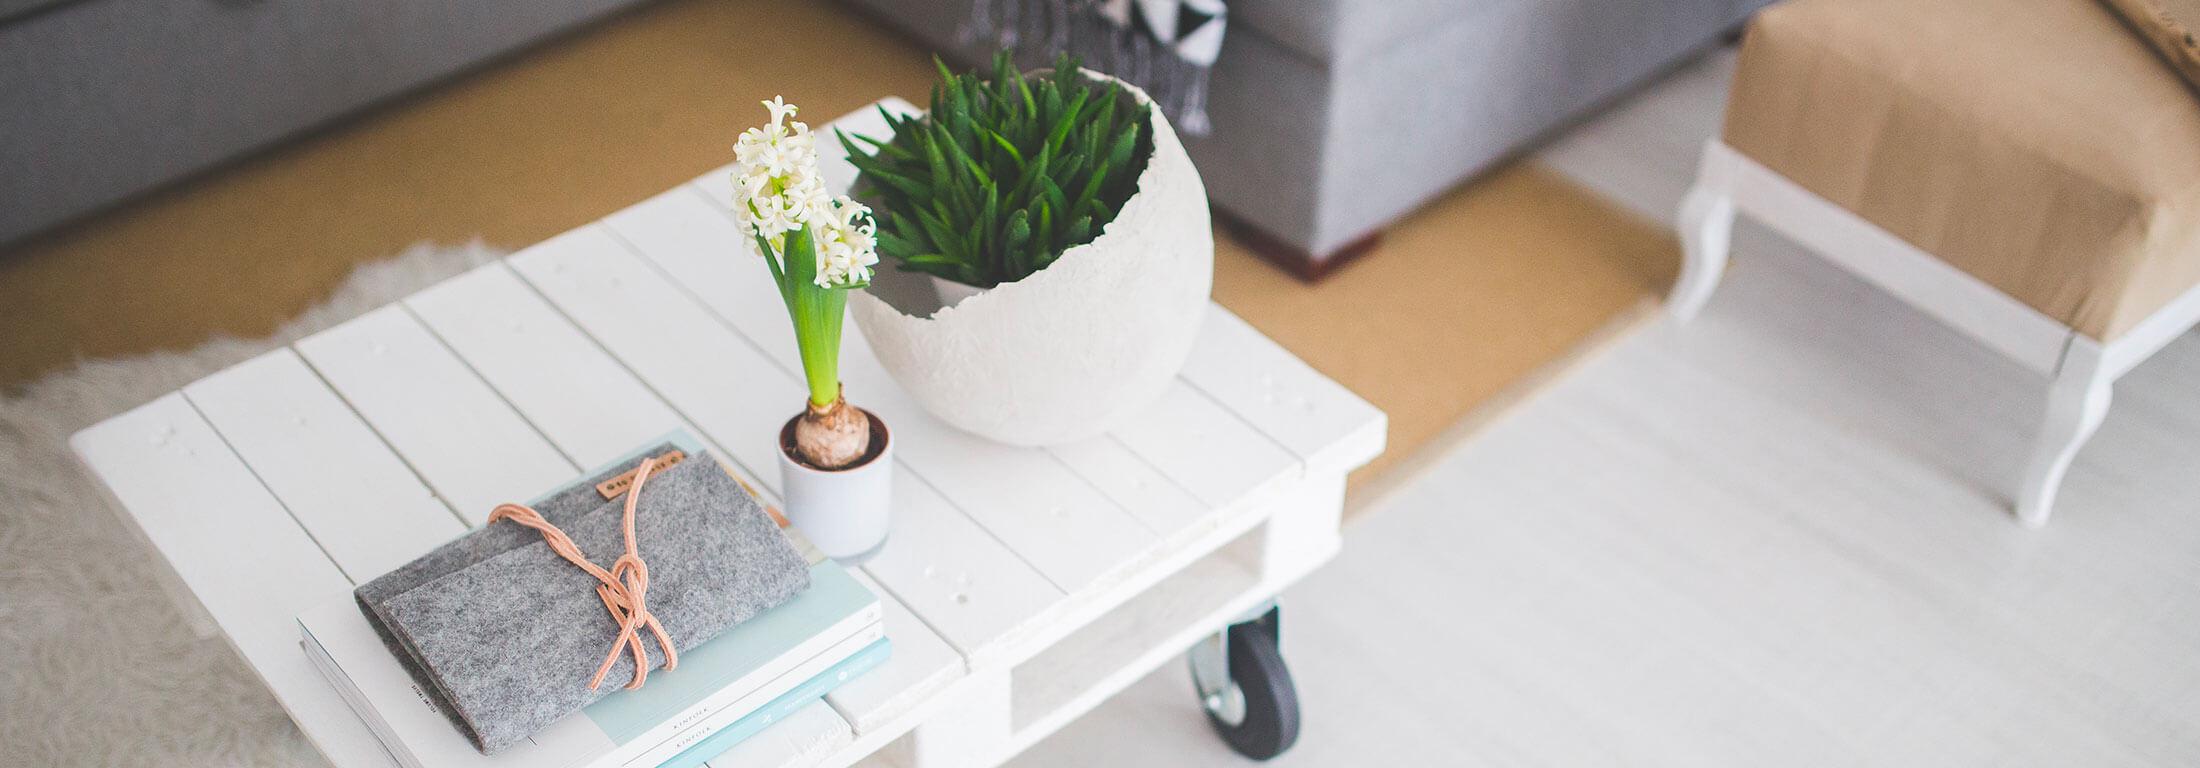 application facebook sav service apr s vente. Black Bedroom Furniture Sets. Home Design Ideas